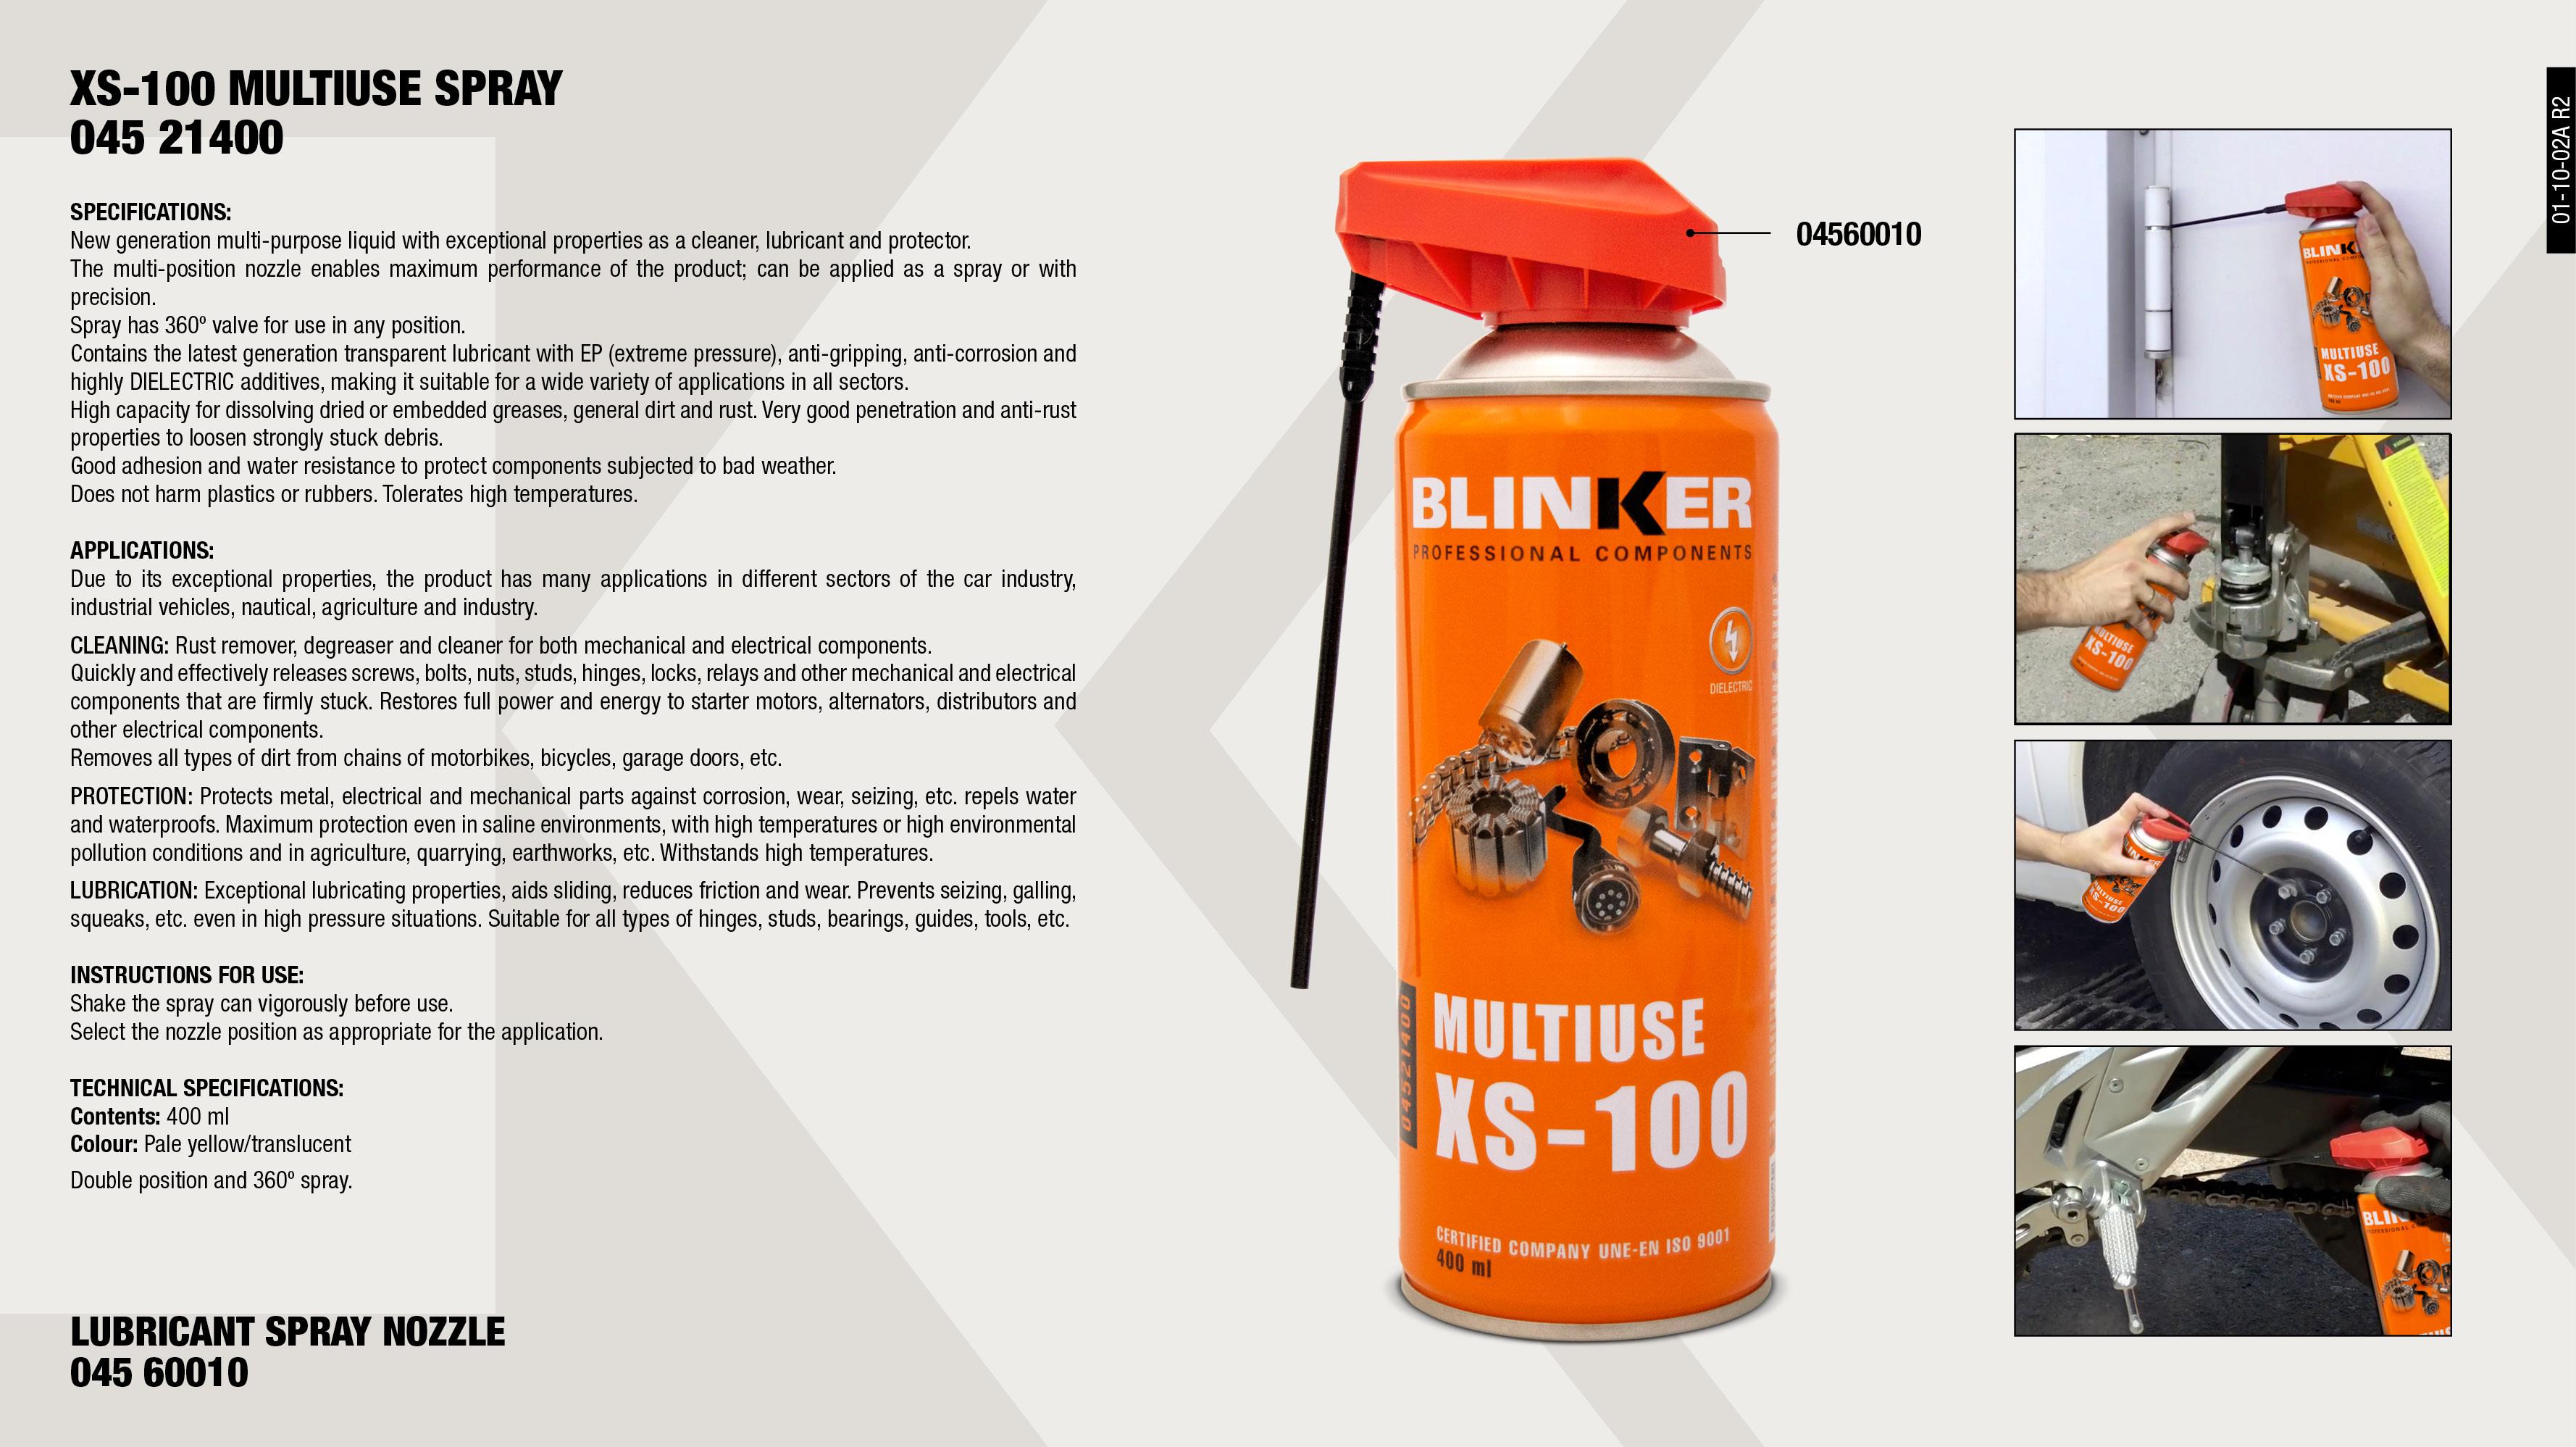 MULTIUSE XS-100 400ML                                       ,  NOZZLE SPRAY LUBRICANT                                      ,